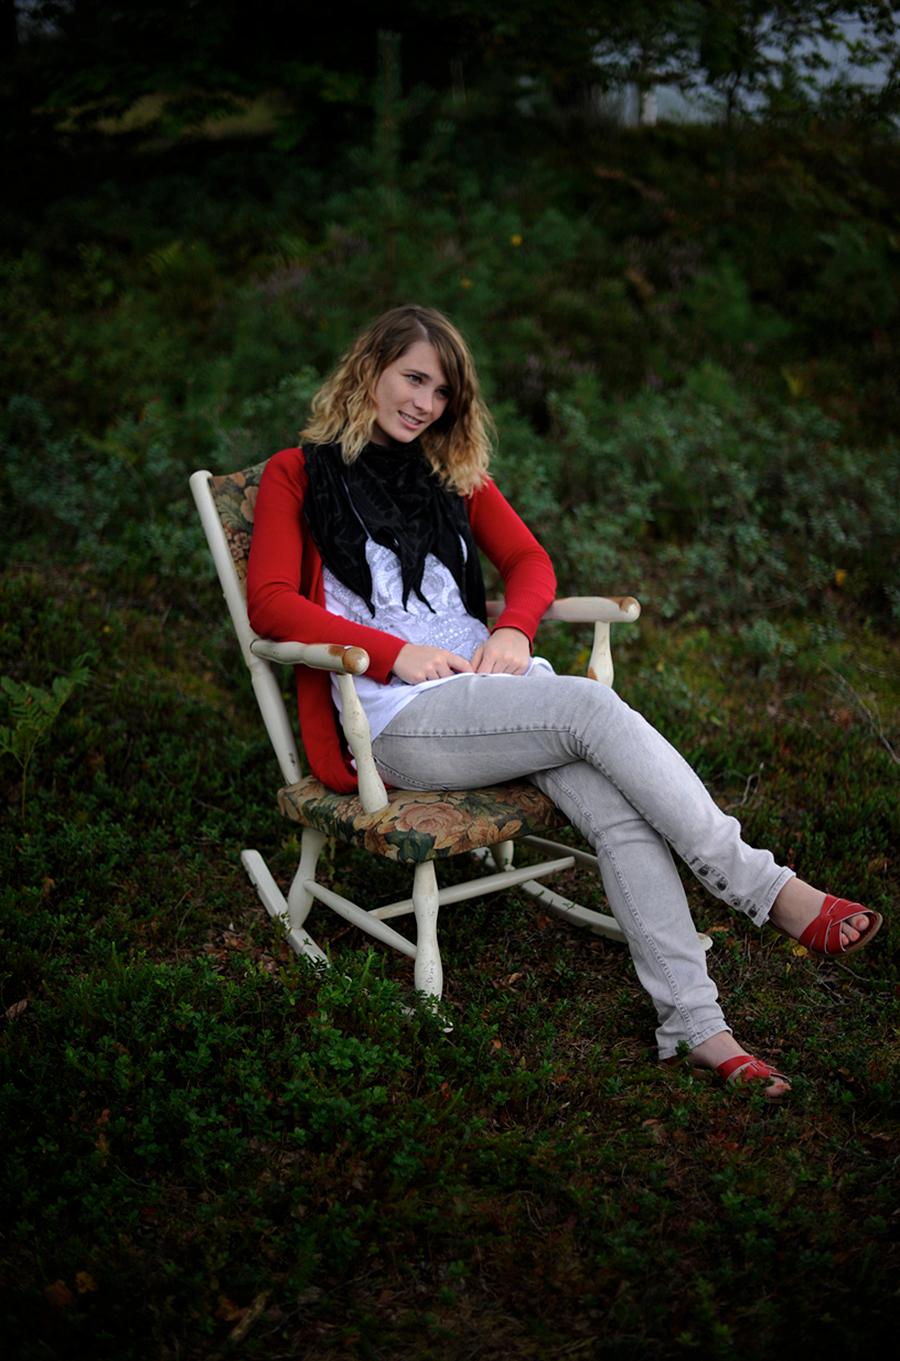 The Swedish Rocking Chair